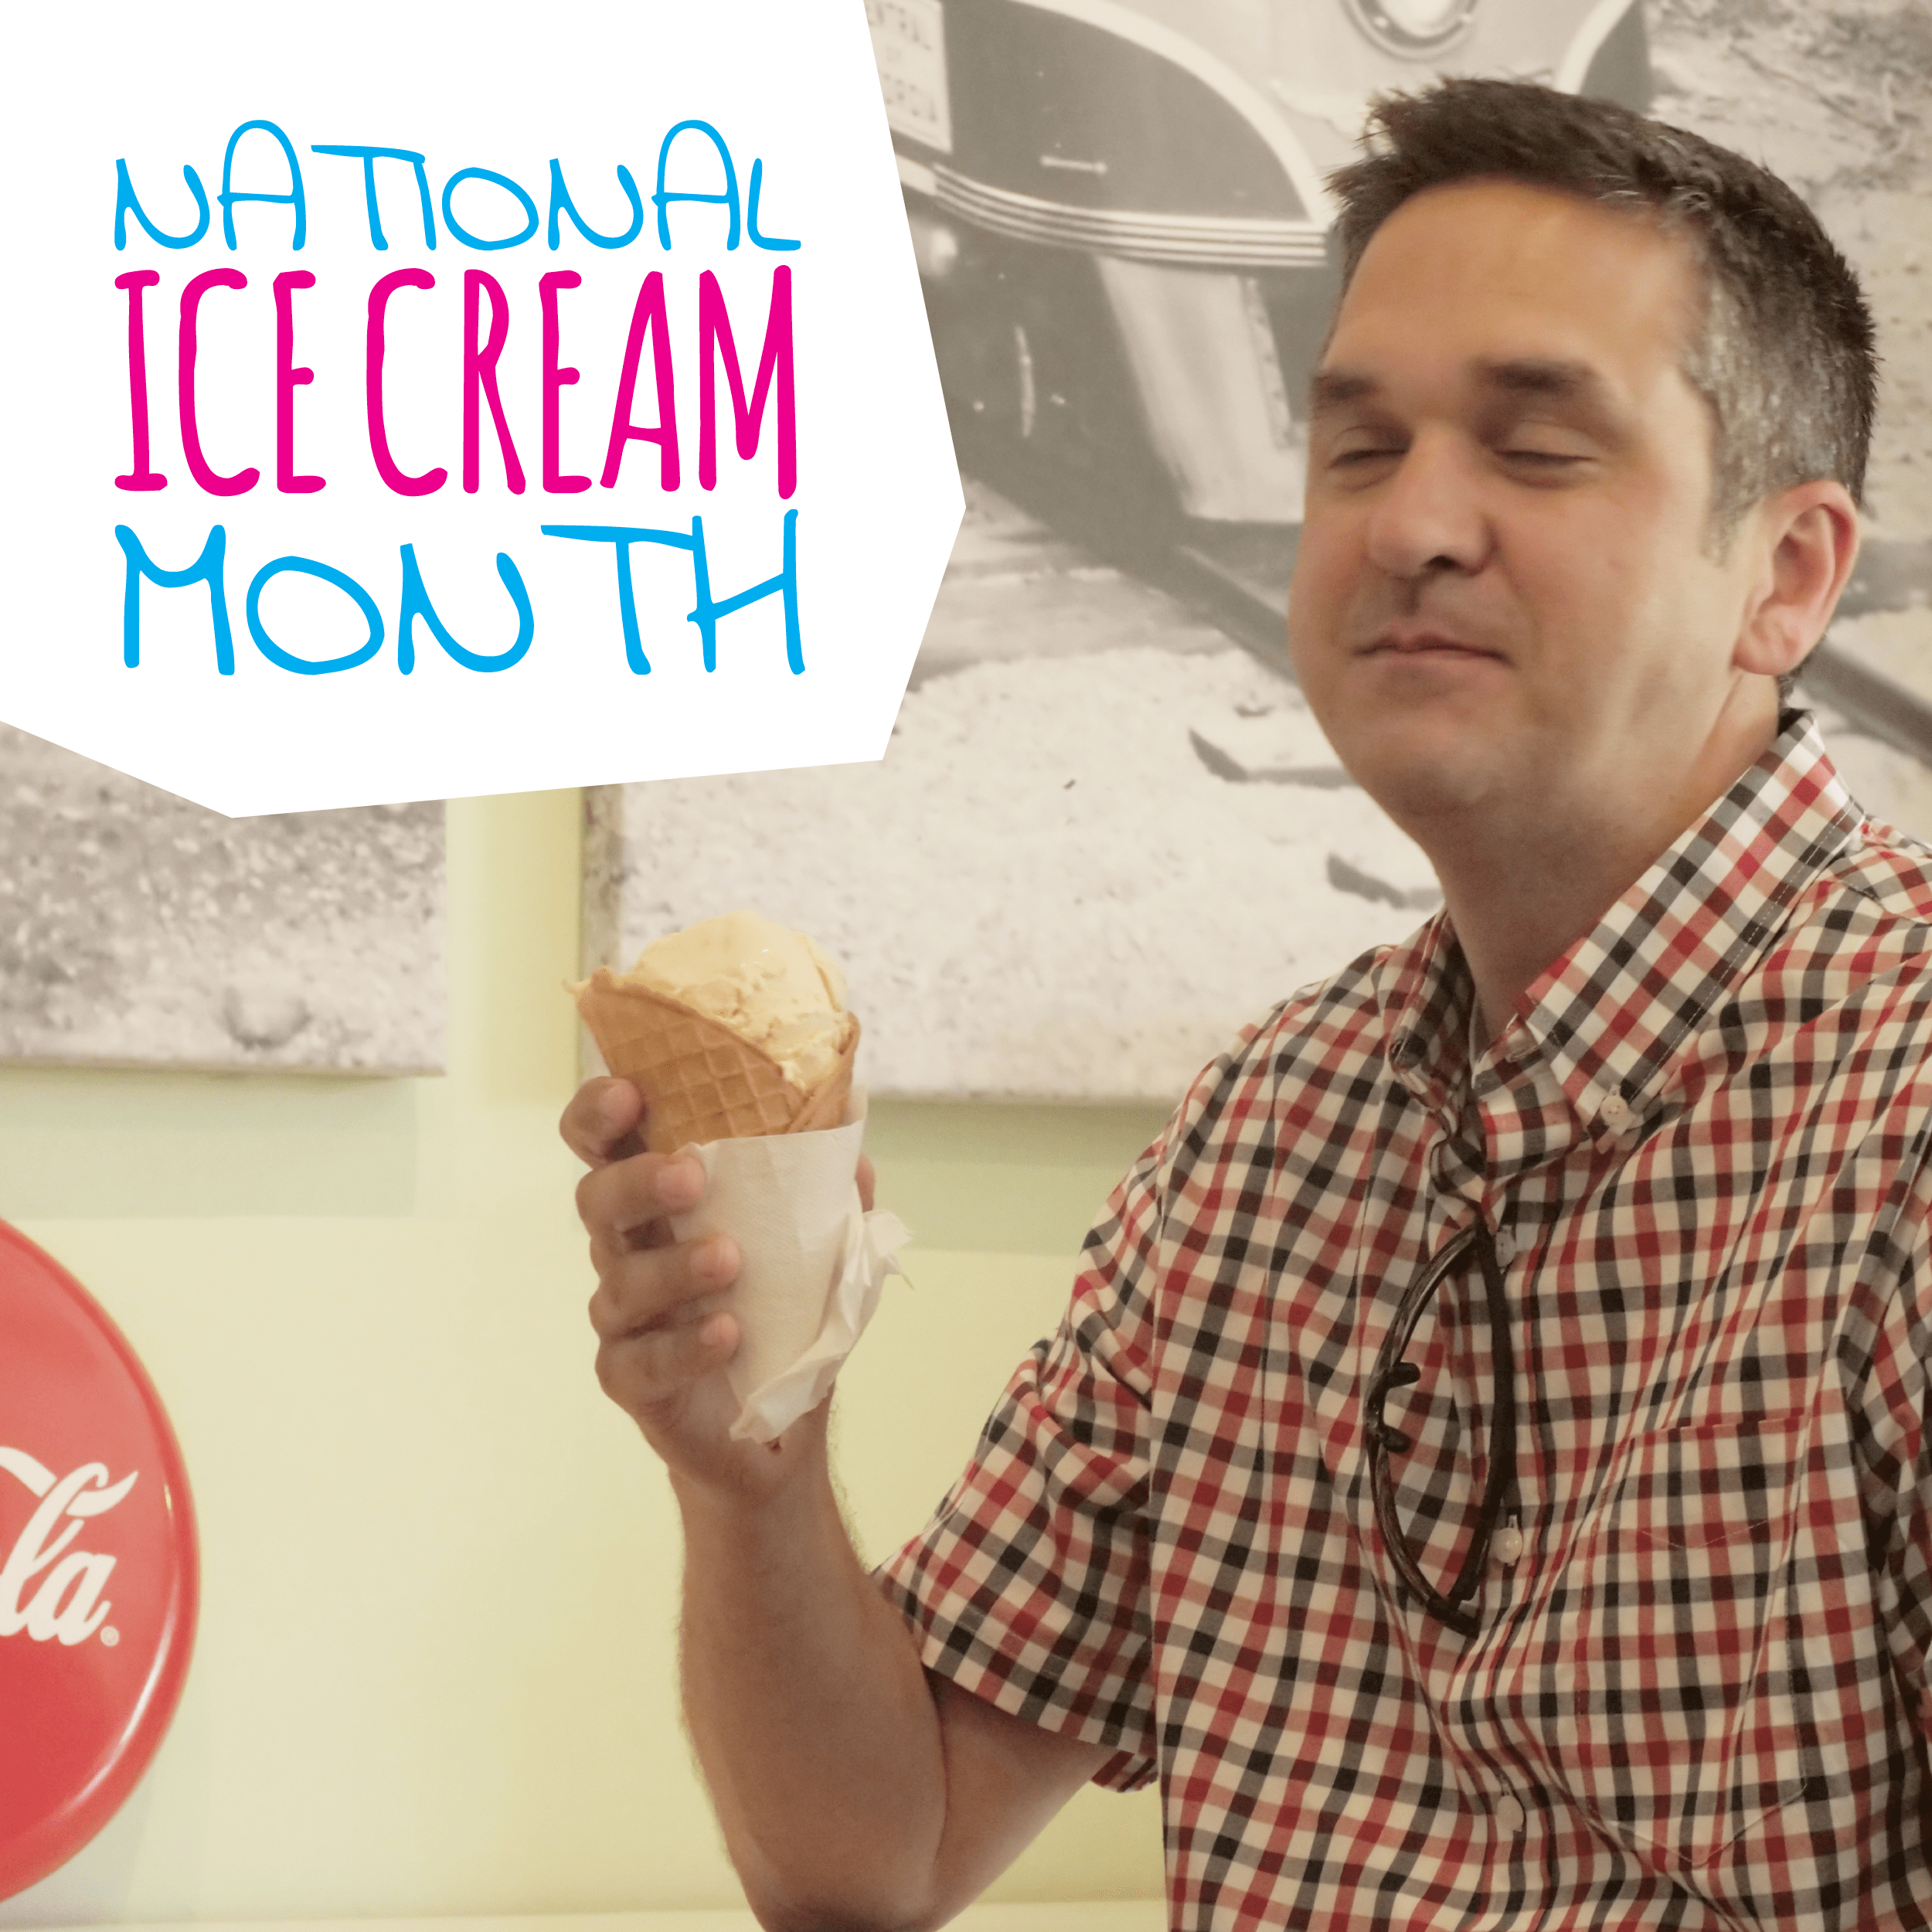 O-Town Ice Cream social media post